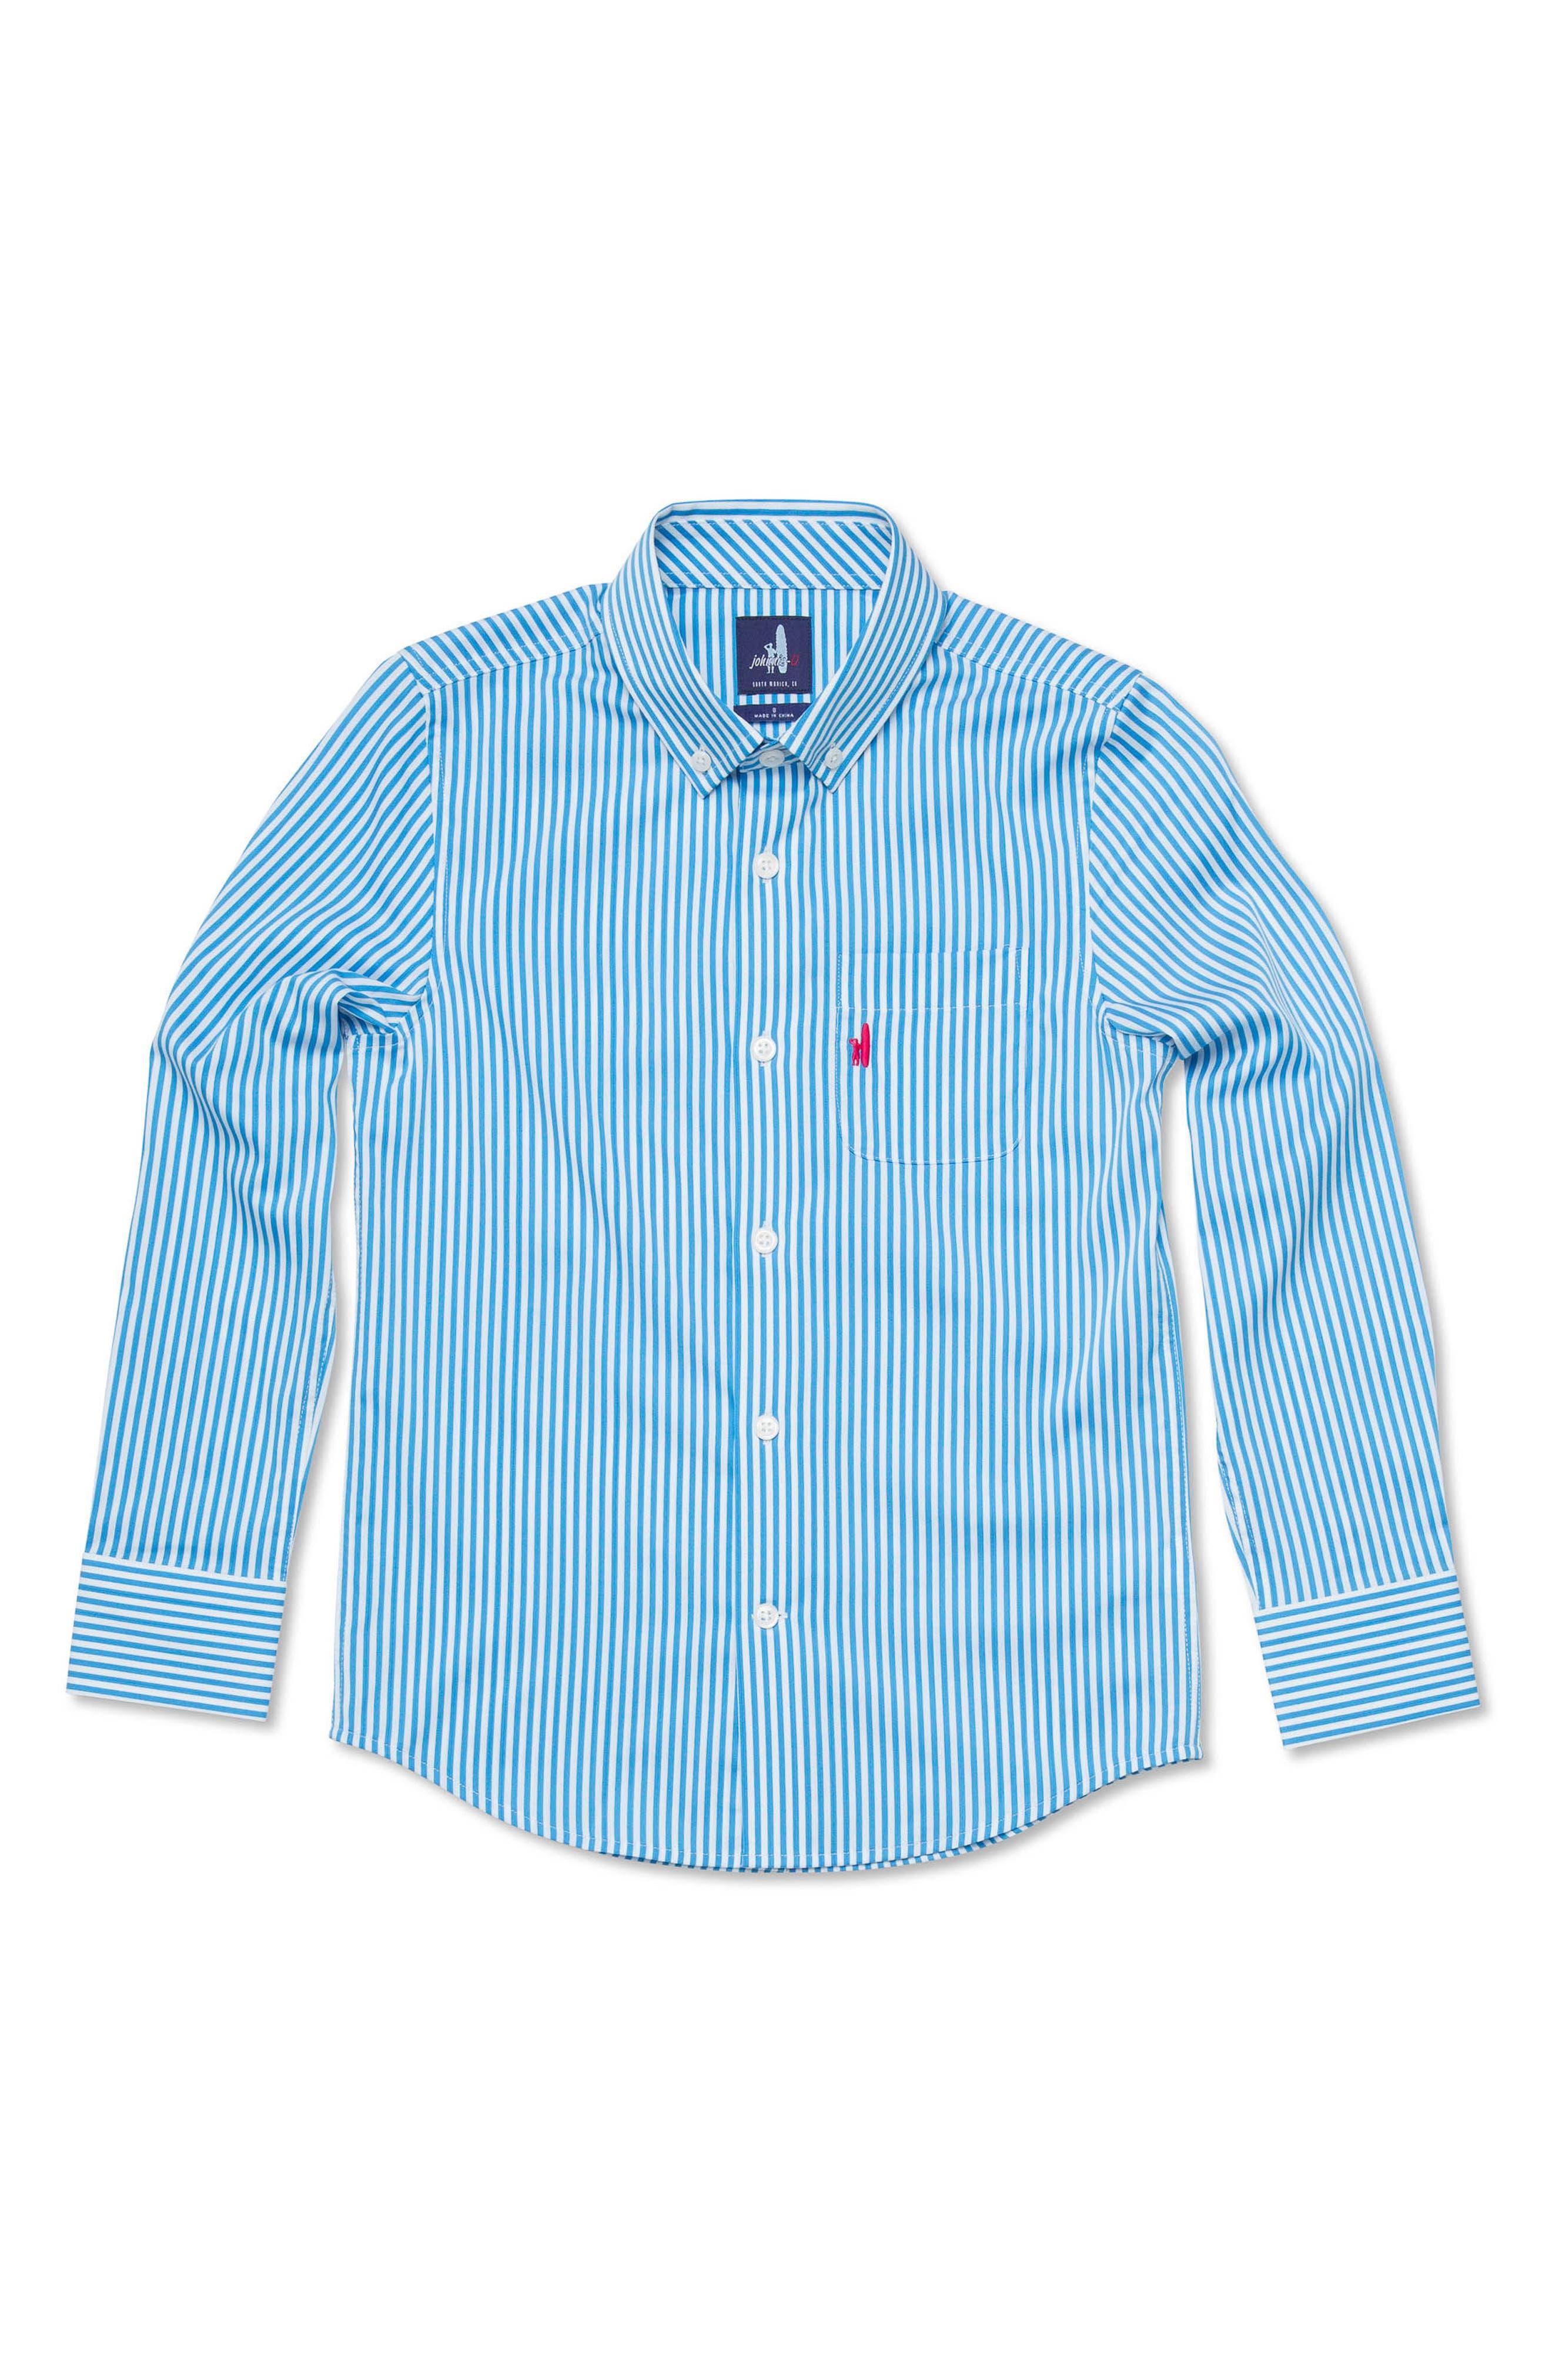 Nole Striped Dress Shirt,                         Main,                         color, 465